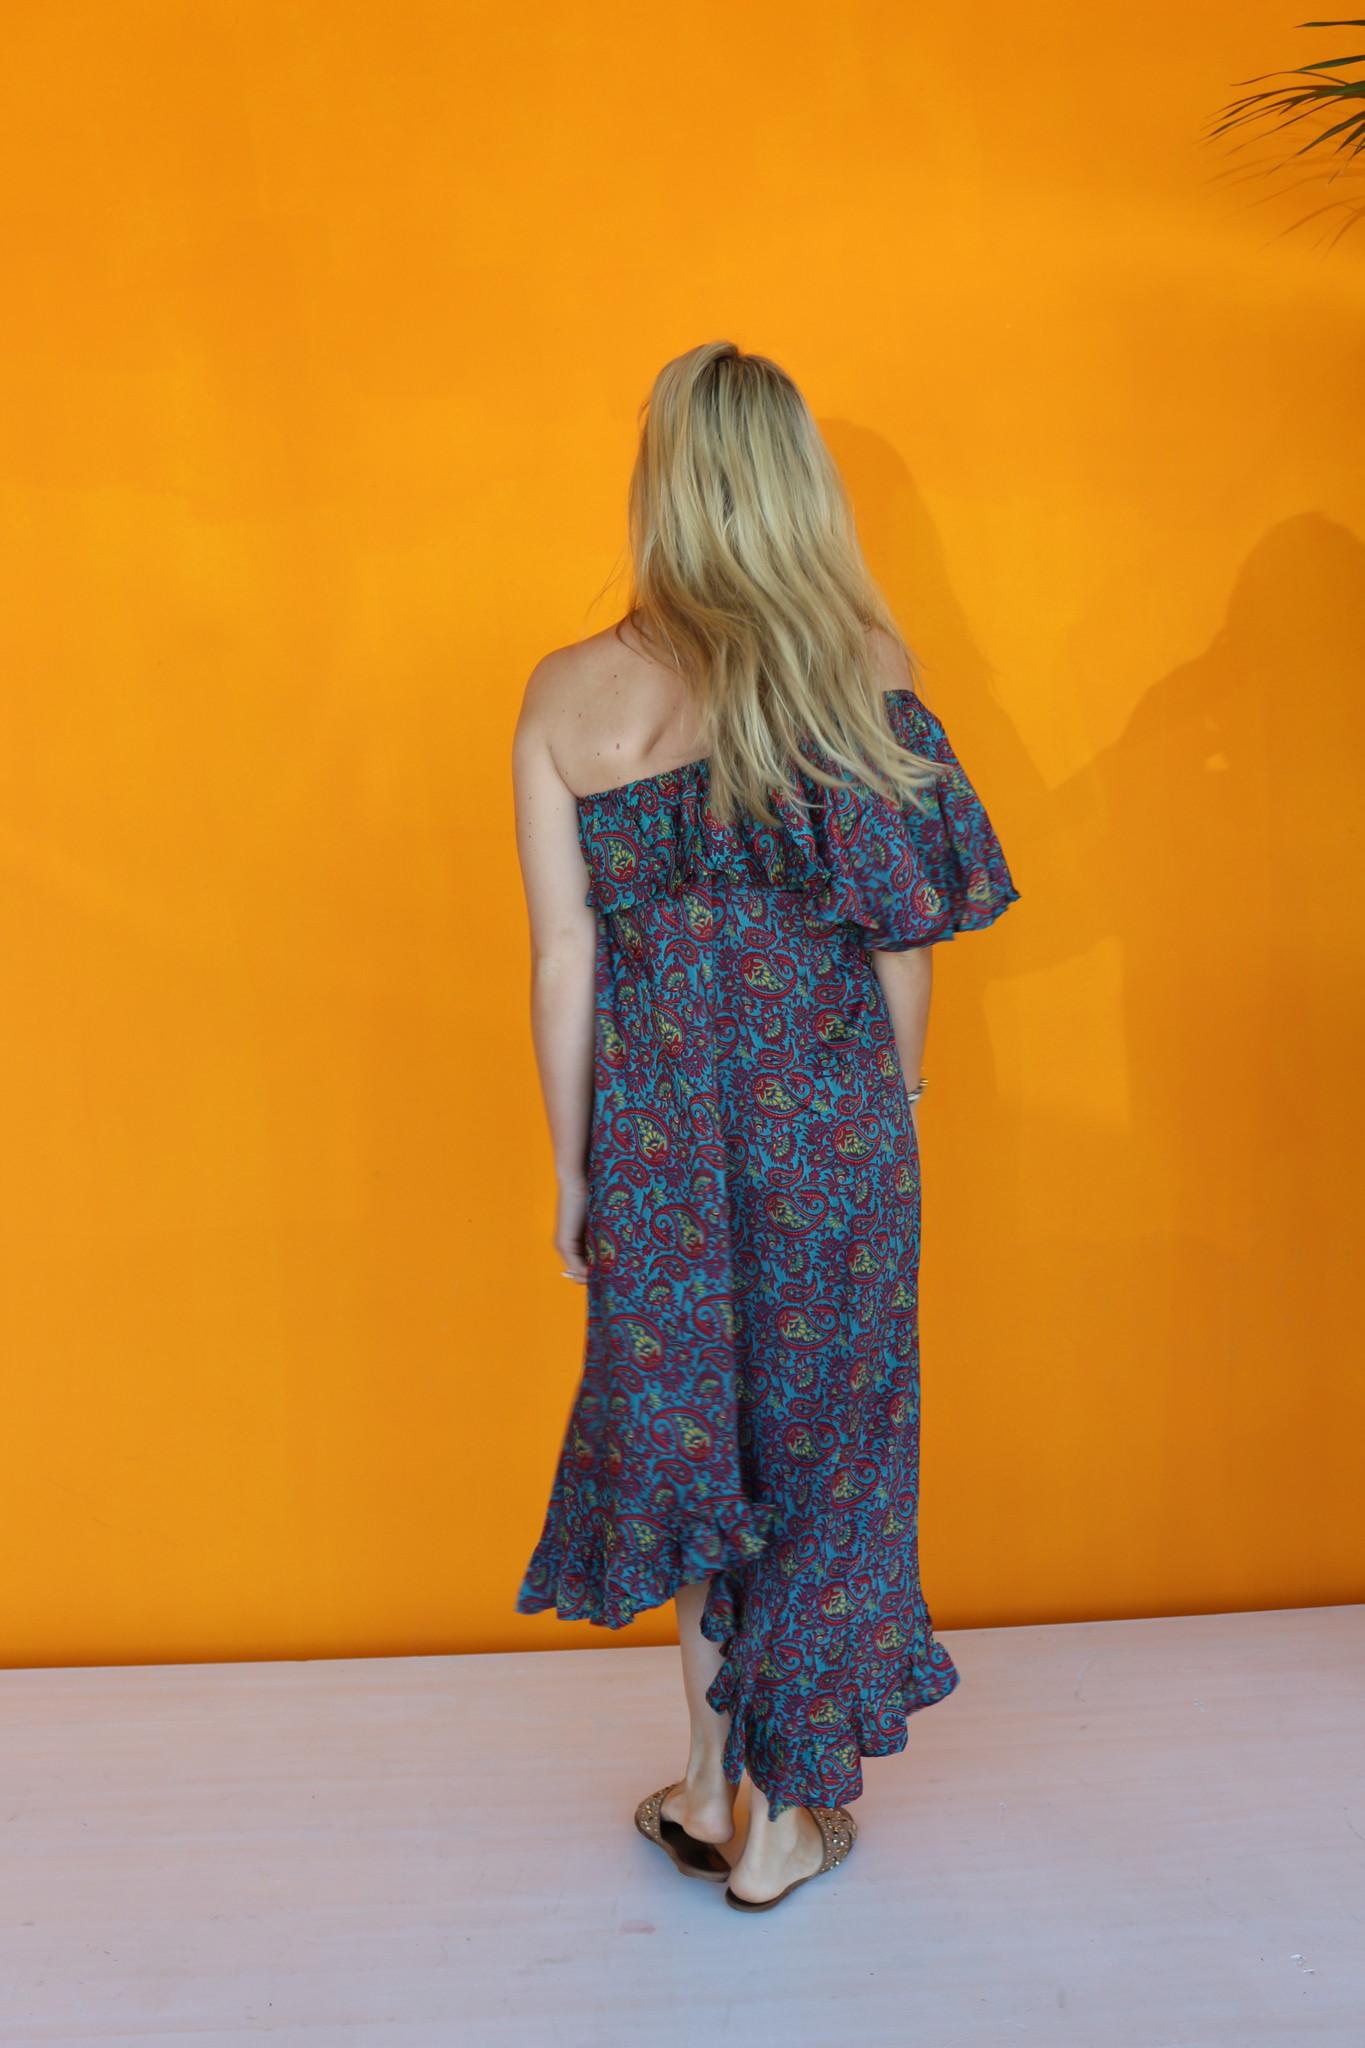 SISSEL EDELBO LUANNA OFF-SHOULDER DRESS FROM SISSEL EDELBO NO.3